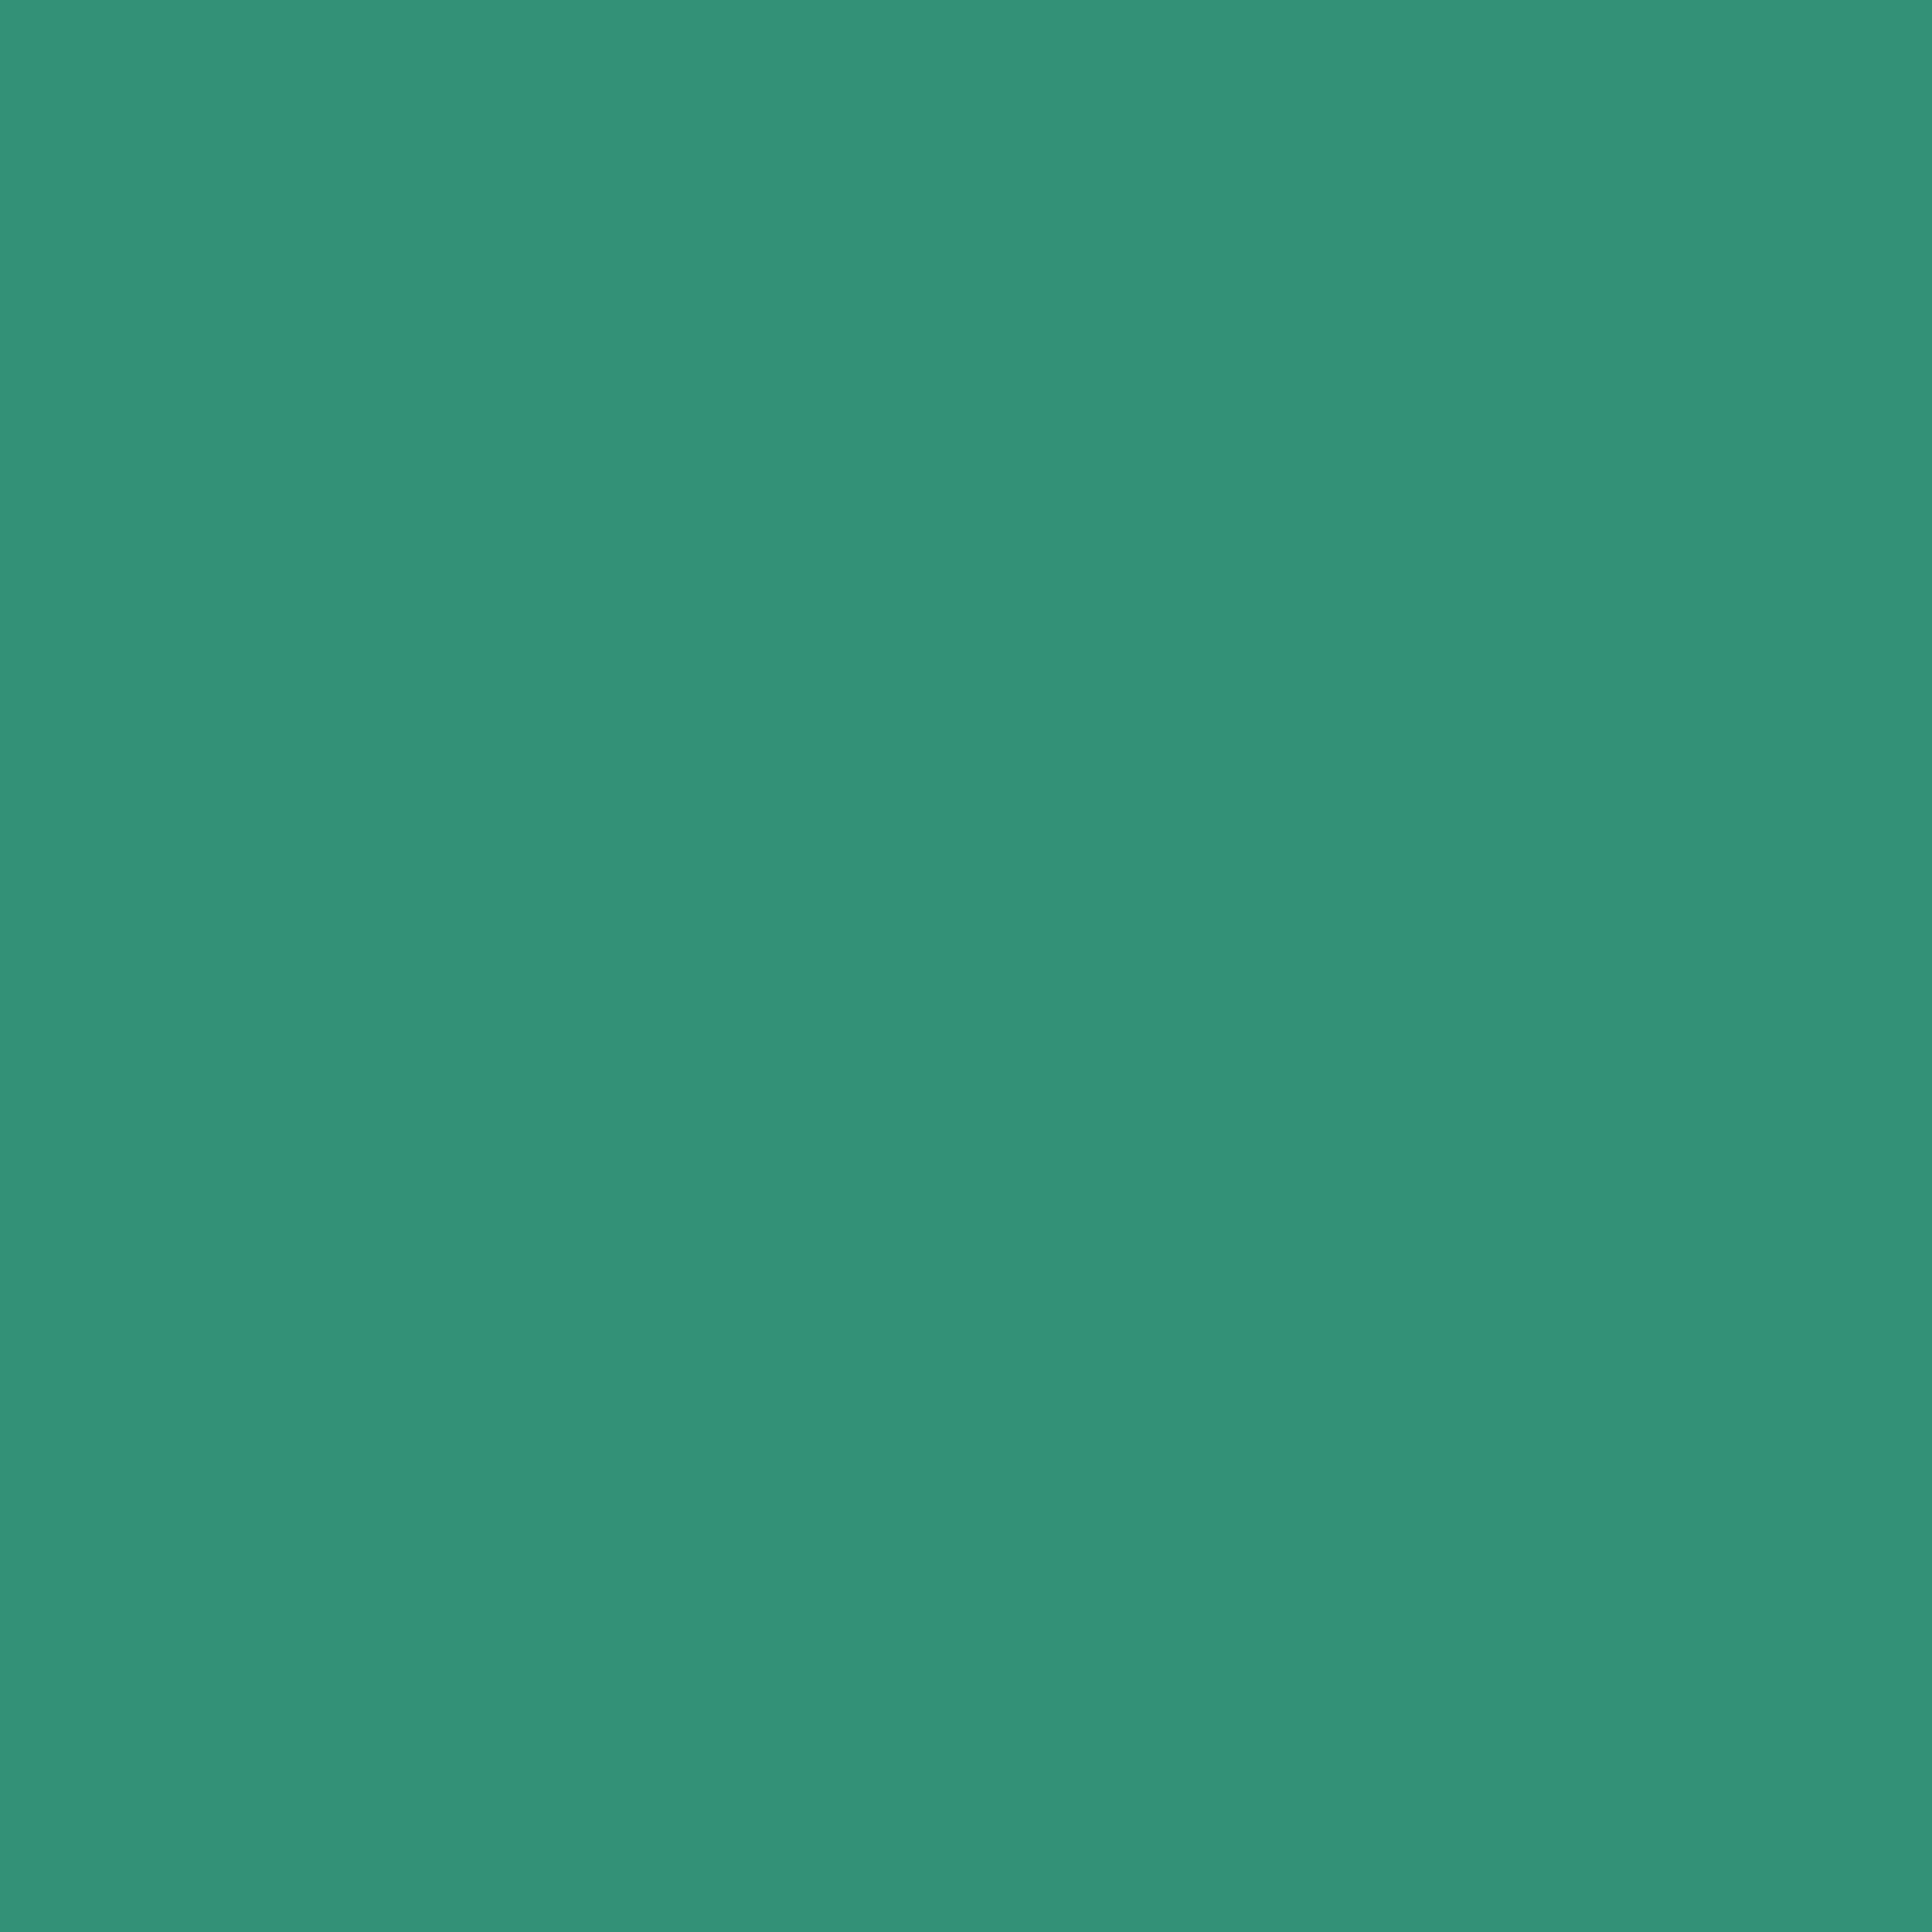 2732x2732 Illuminating Emerald Solid Color Background